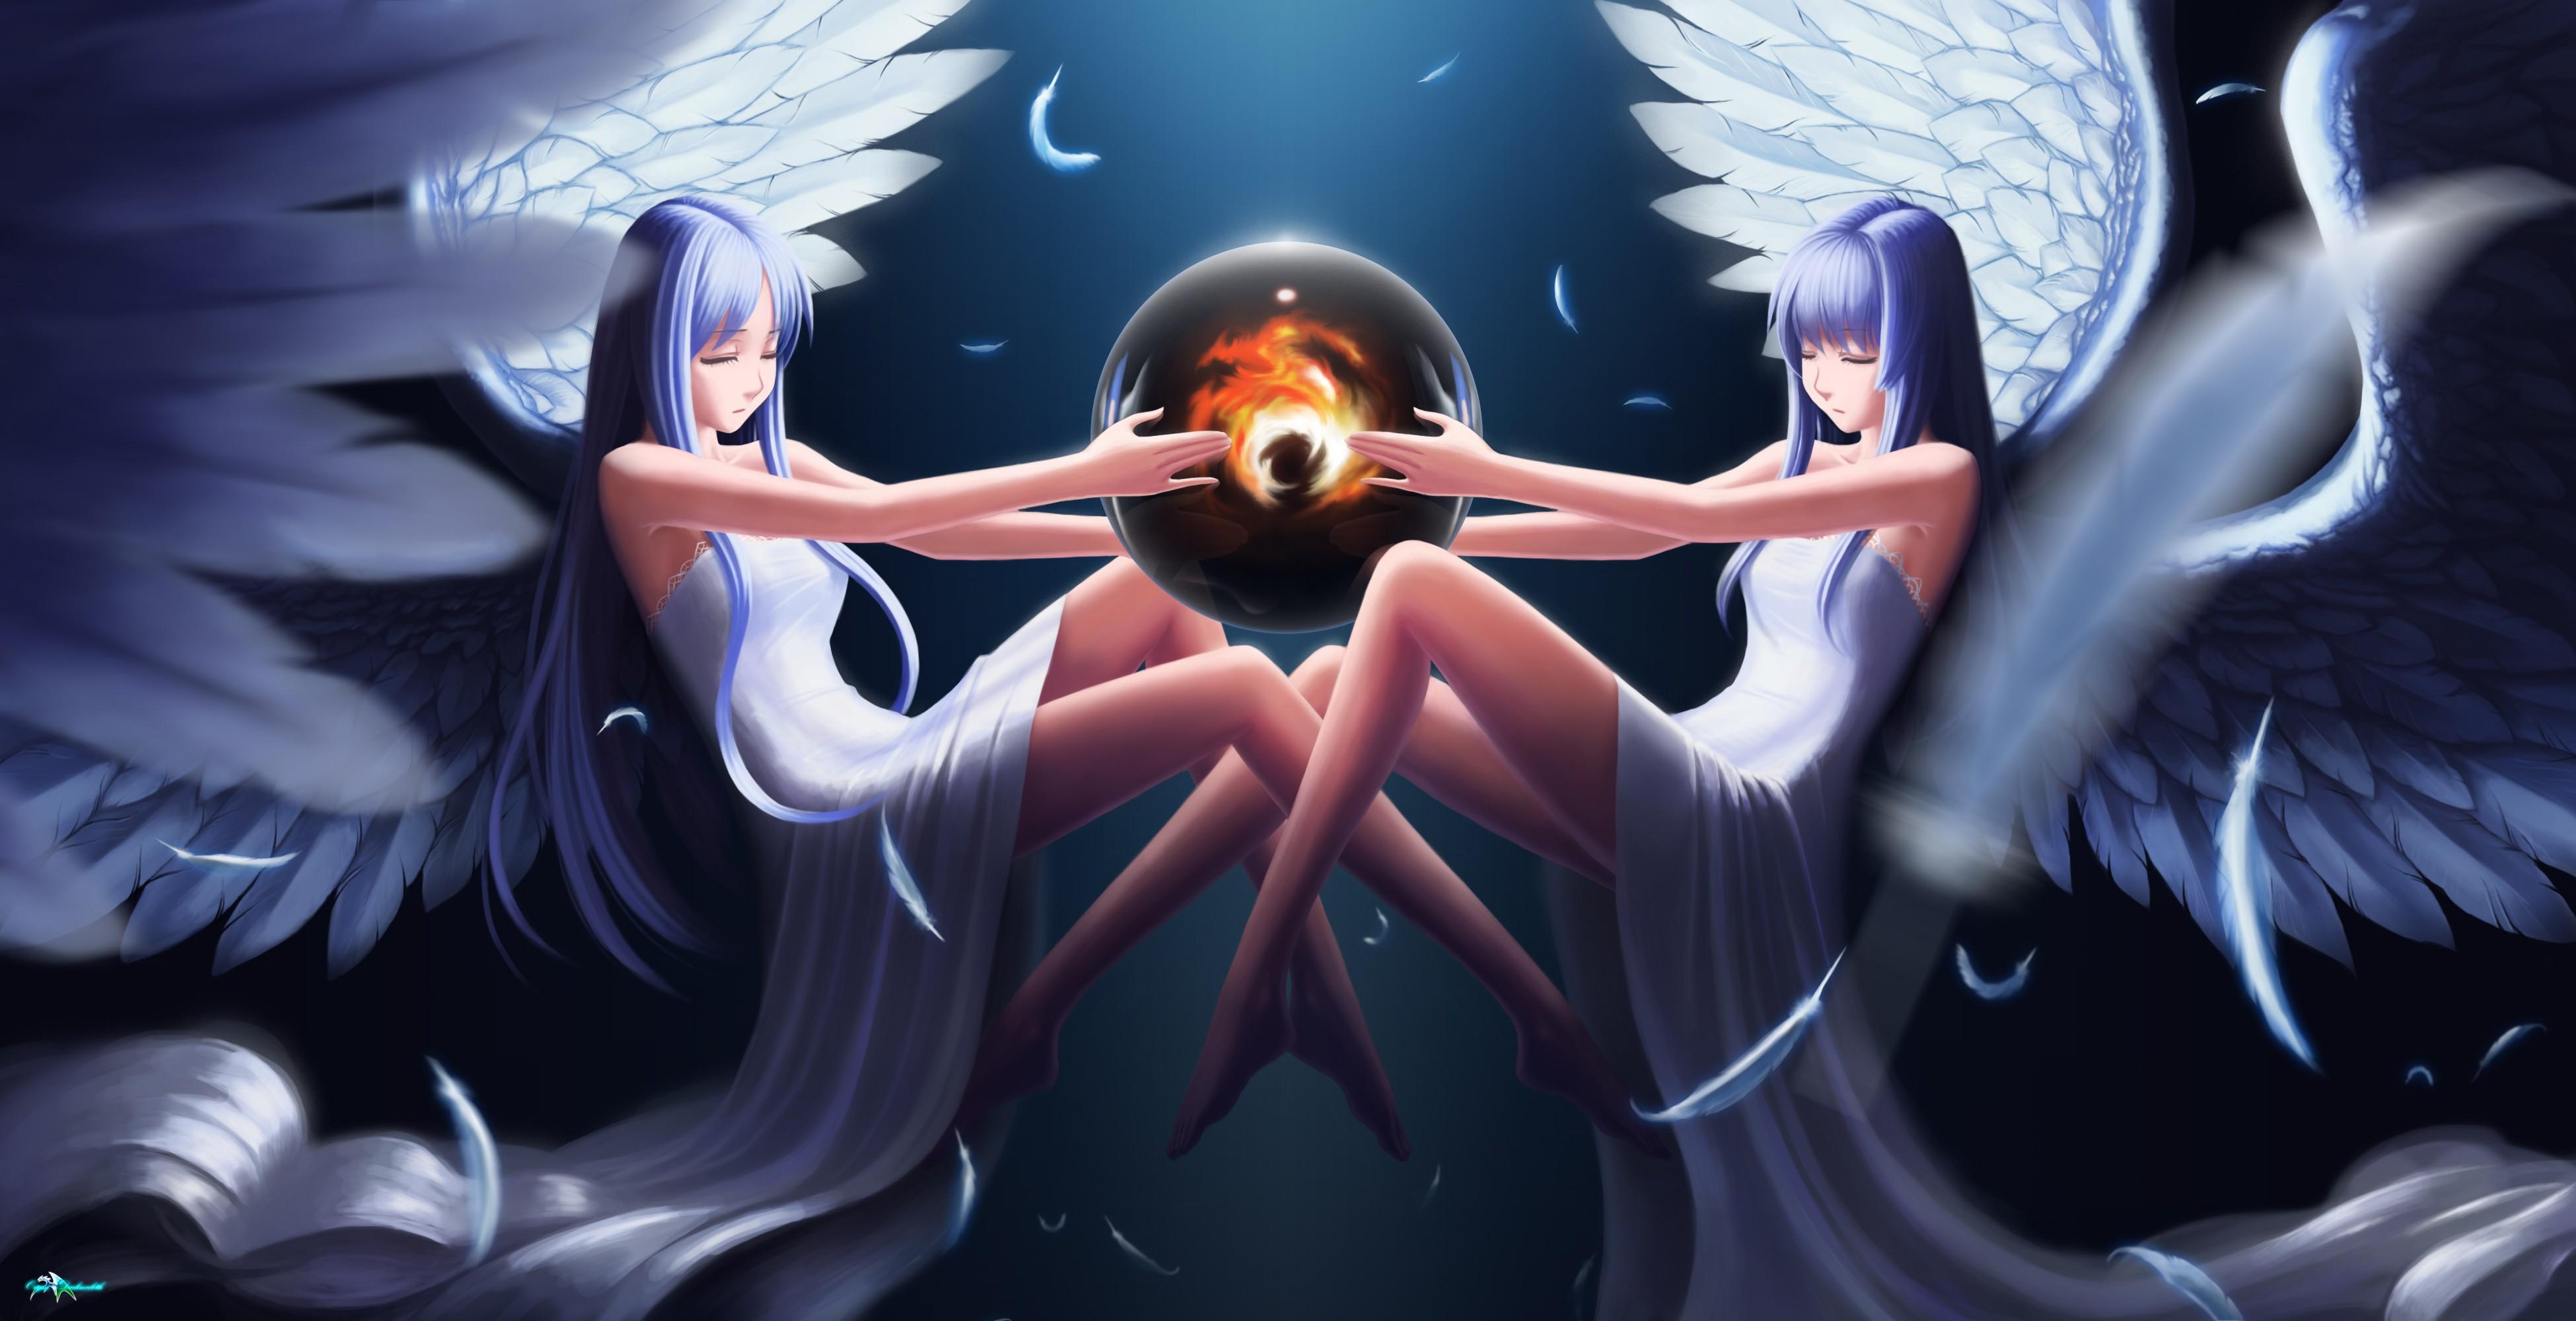 Anime 3900x2000 anime anime girls angel wings legs